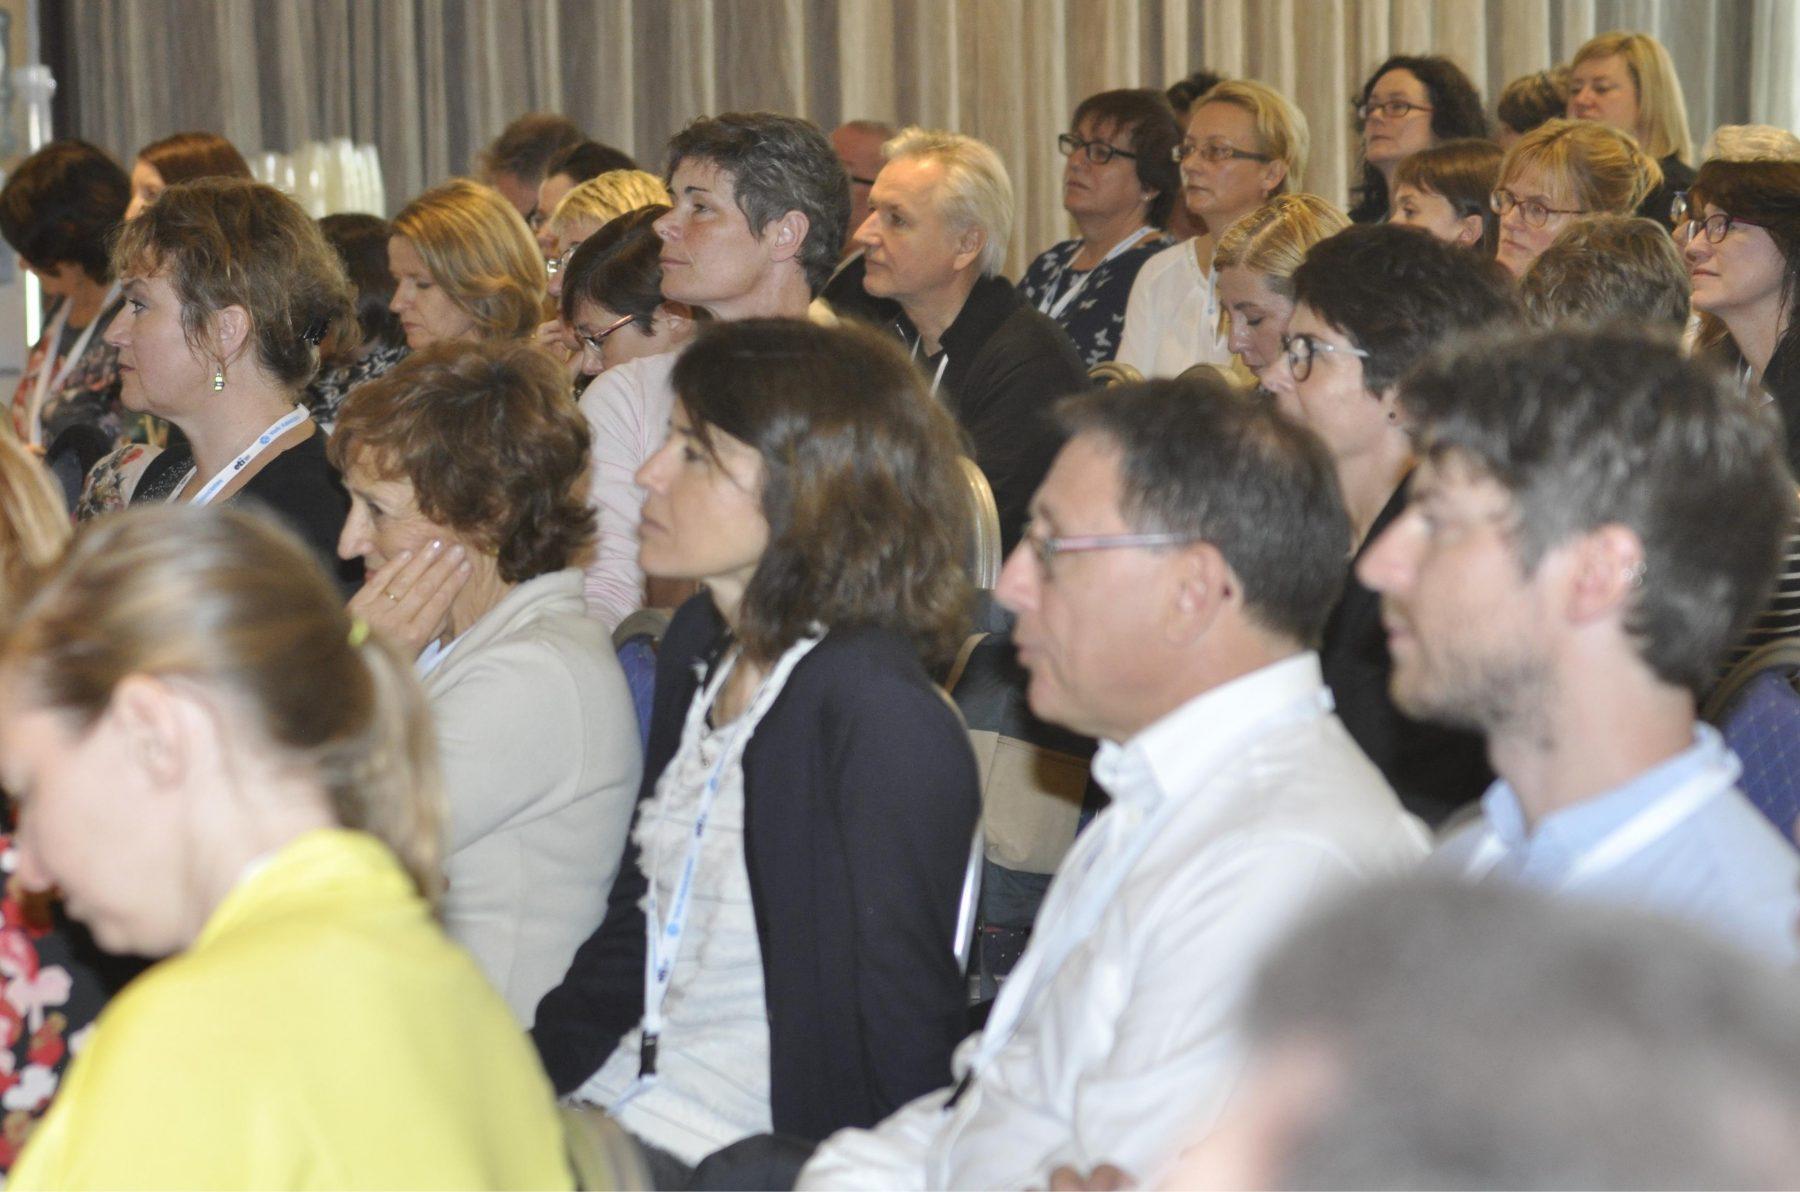 Malta audience